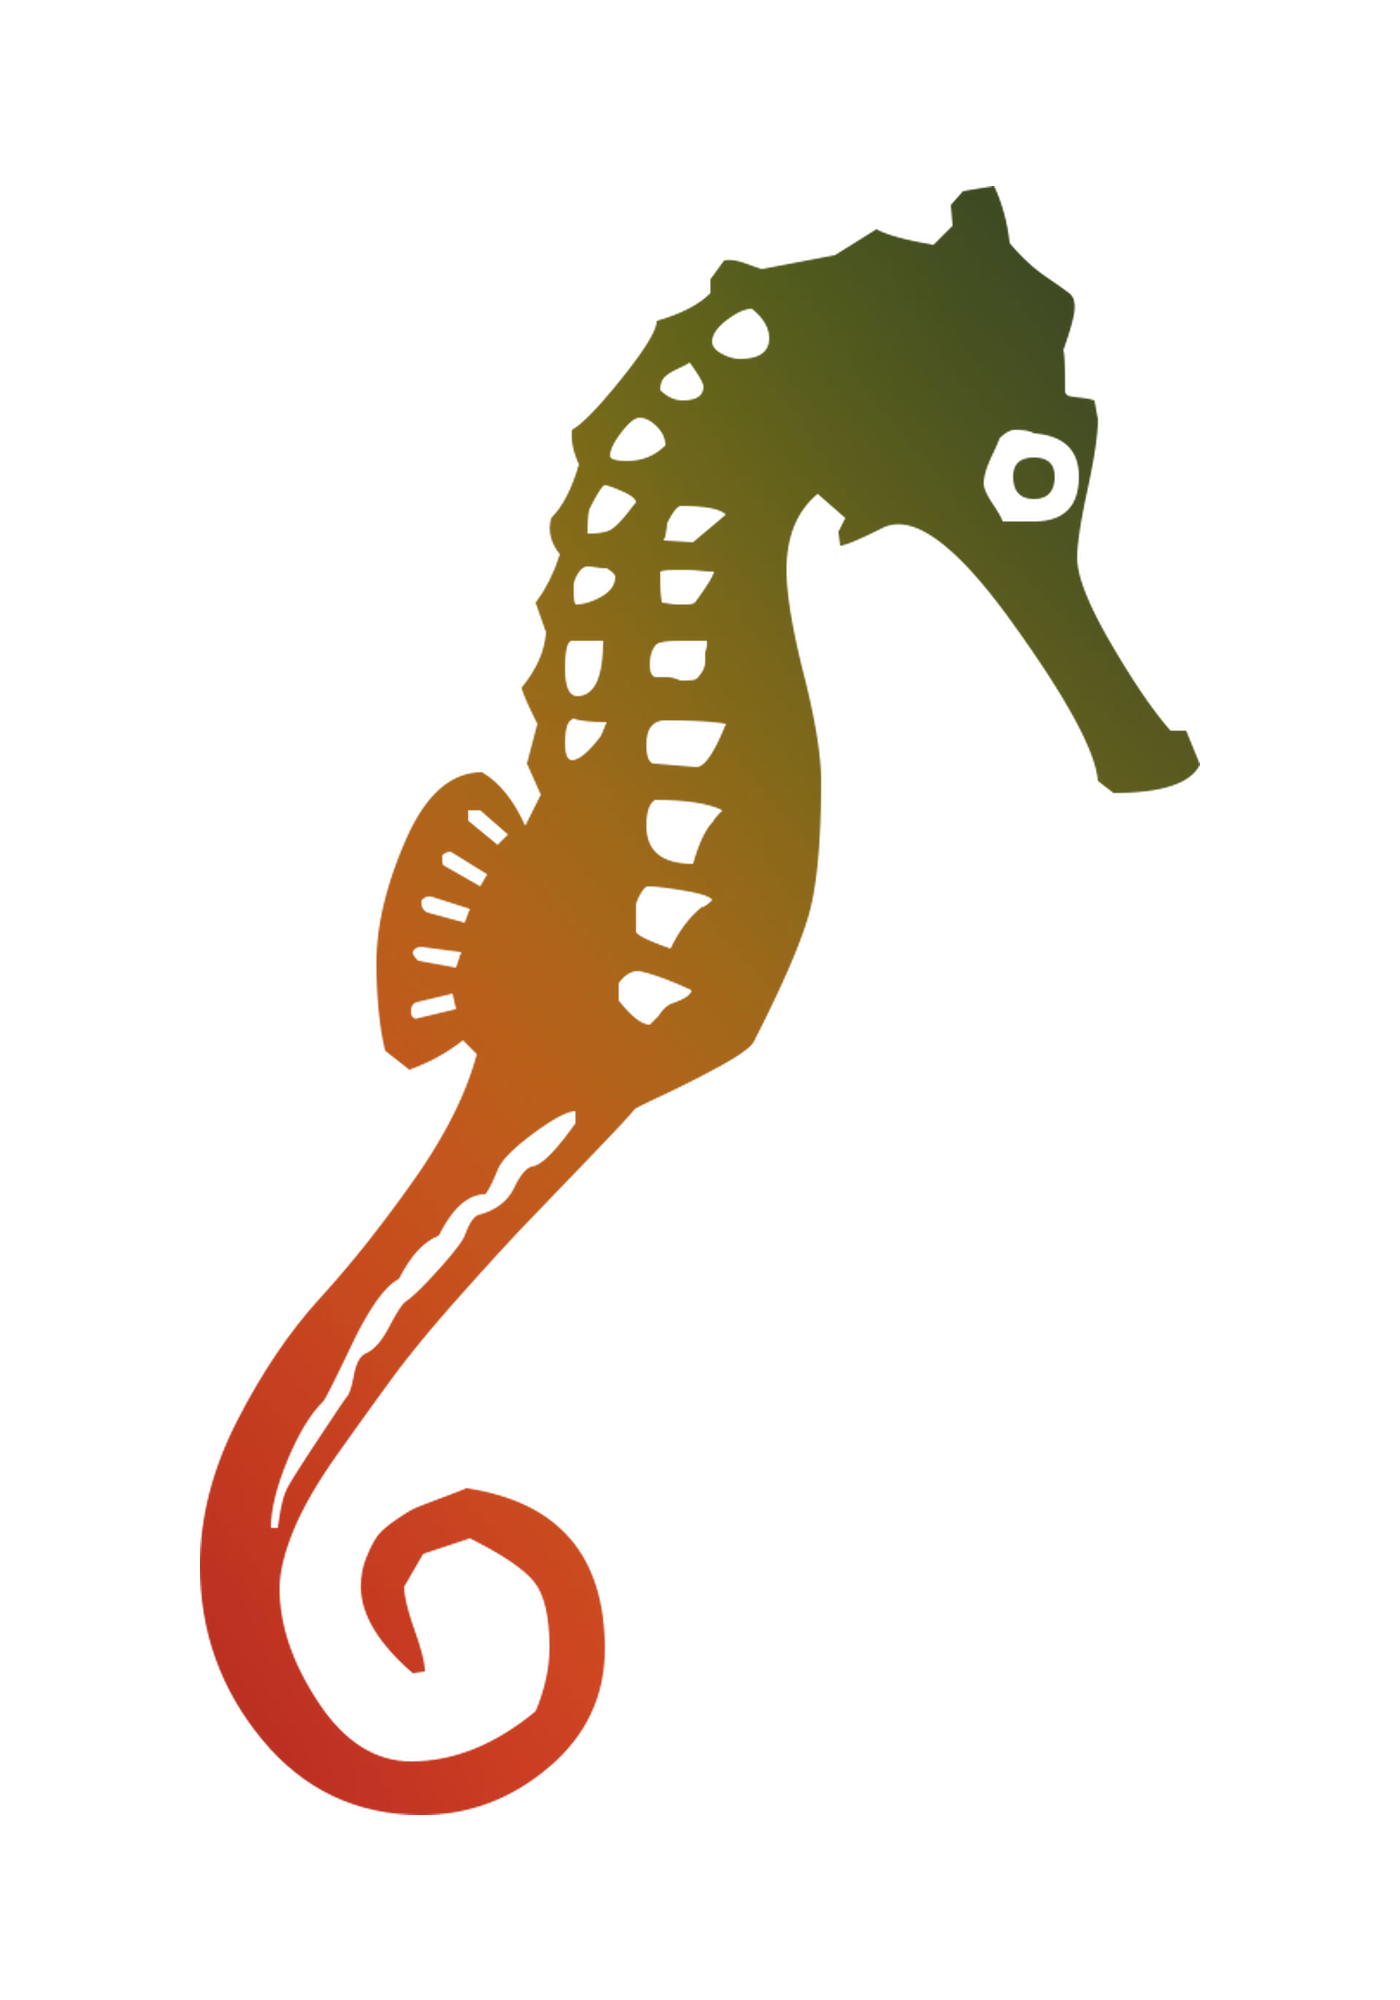 Seahorse Illustration Graphics Free Hq Image Seahorse Image Cartoon Drawings Clip Art